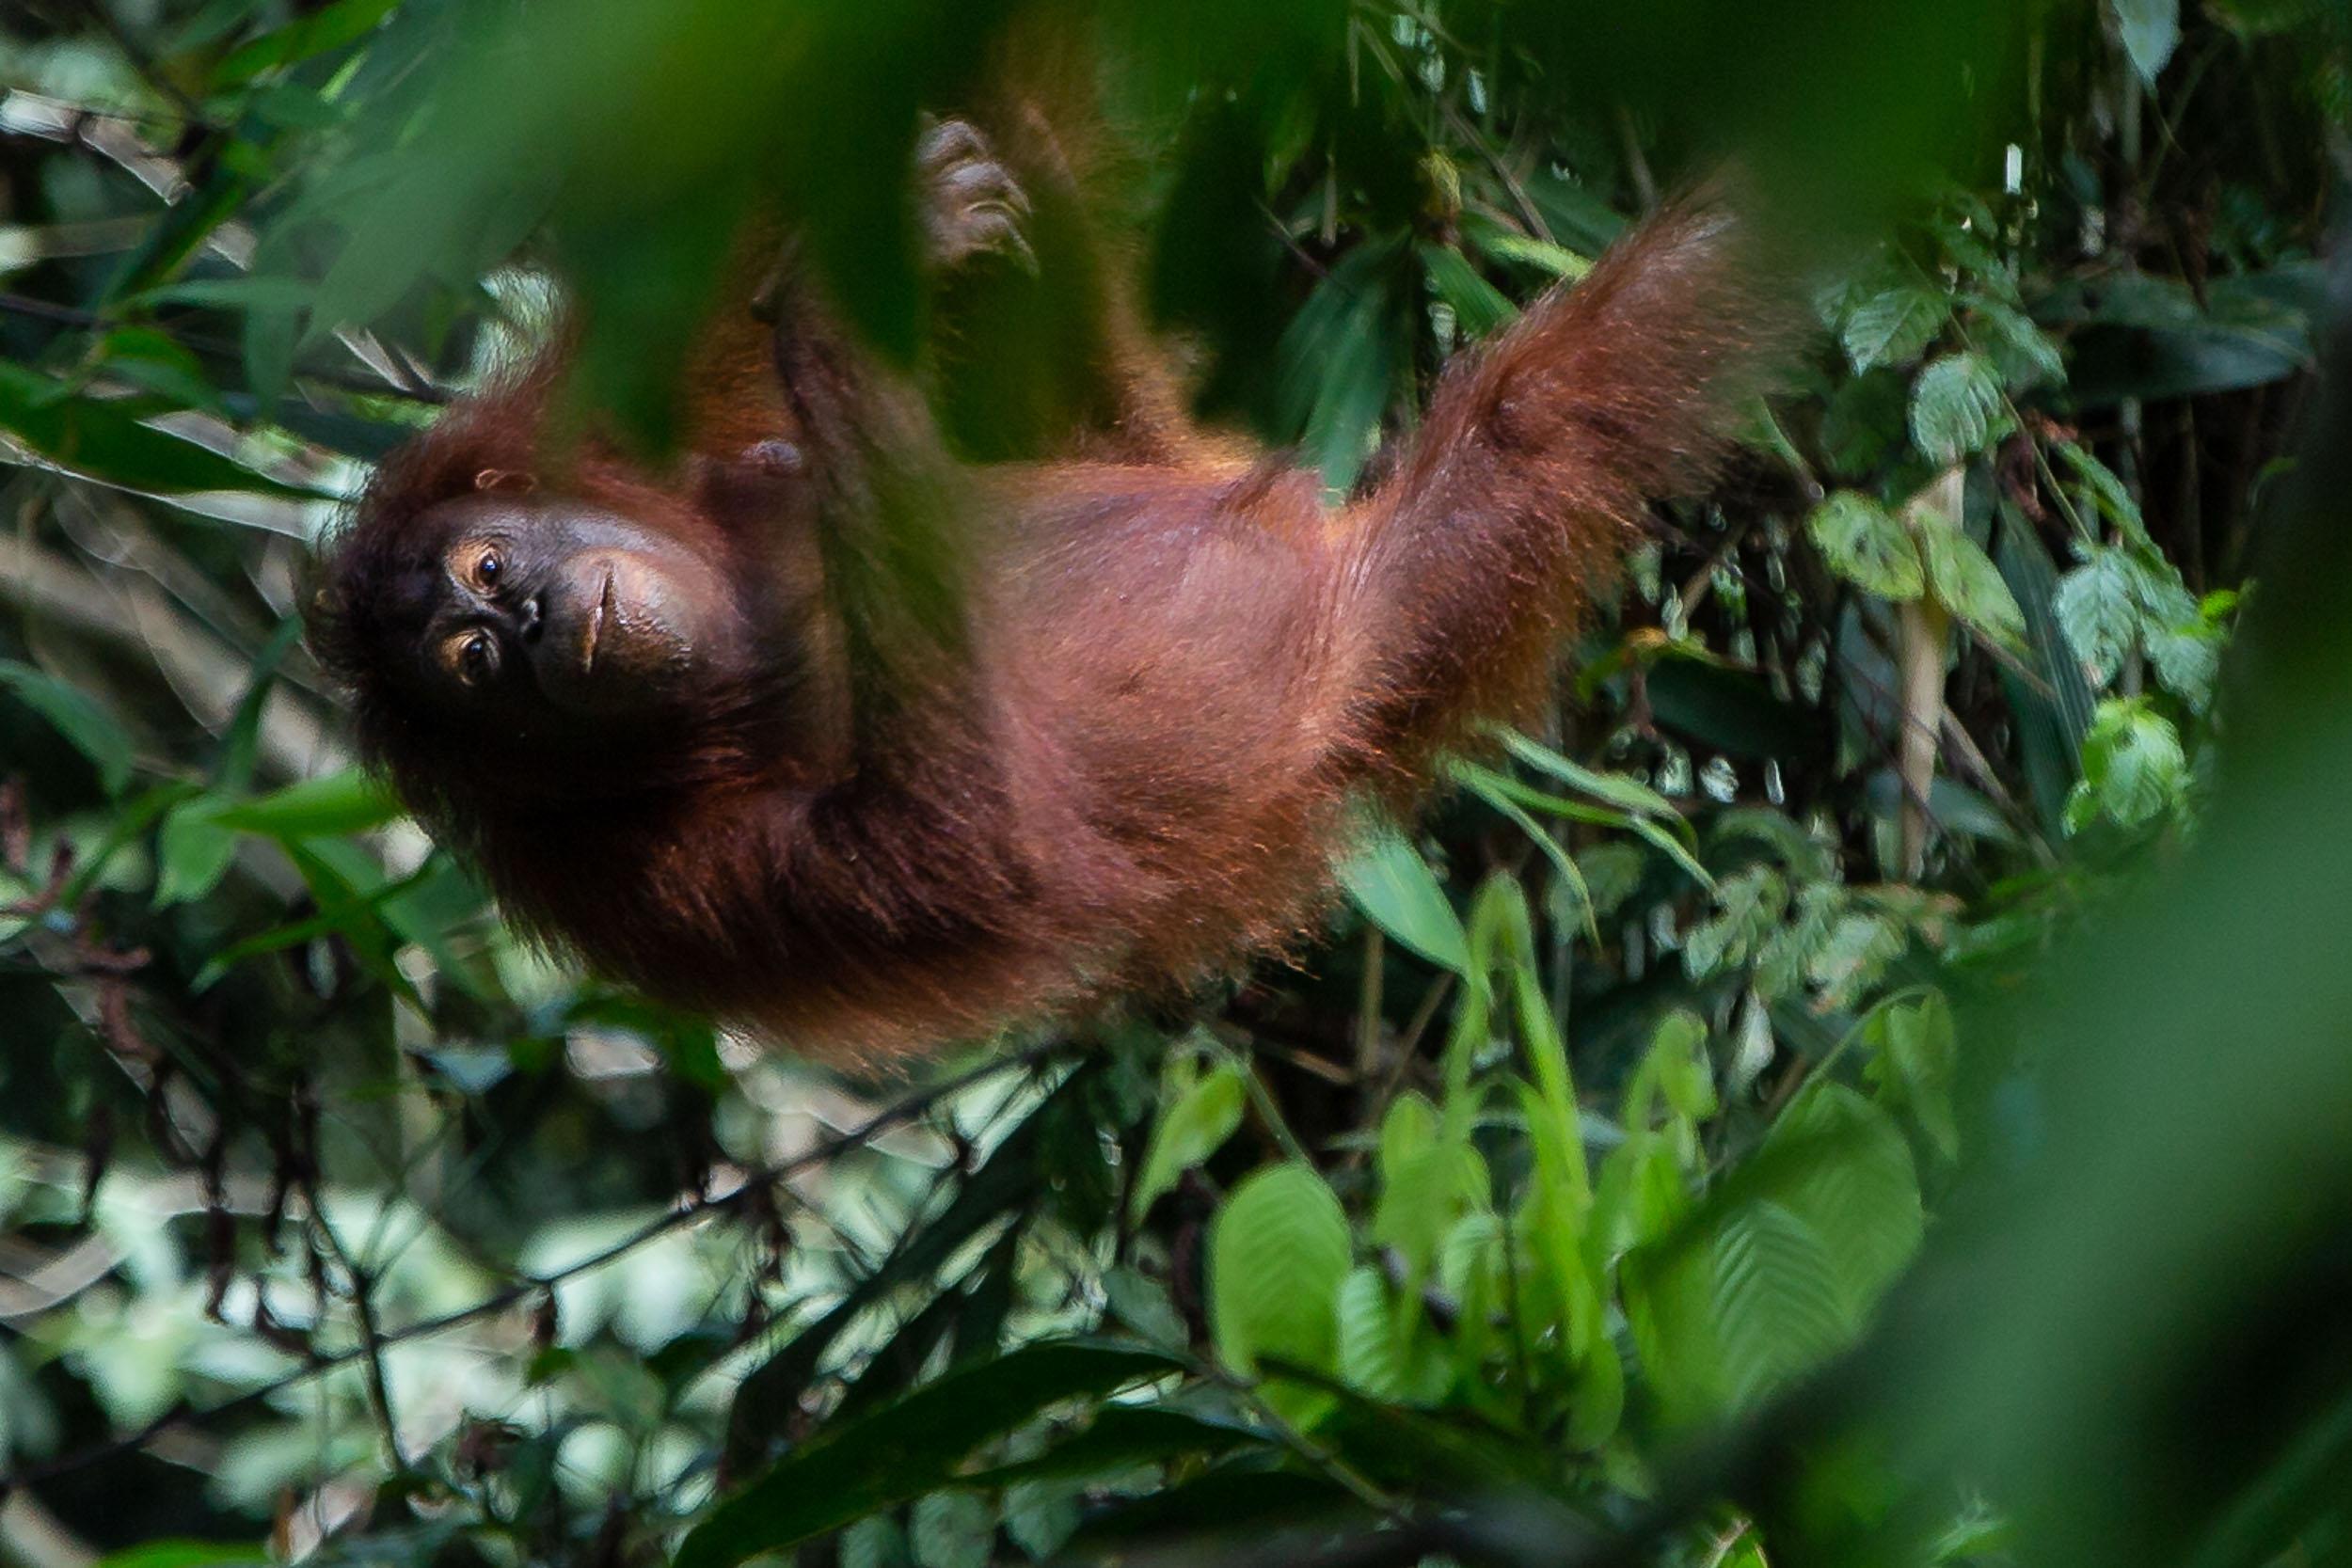 Rescued Female Orangutan at The Sepilok Orangutan Rehabilitation Centre